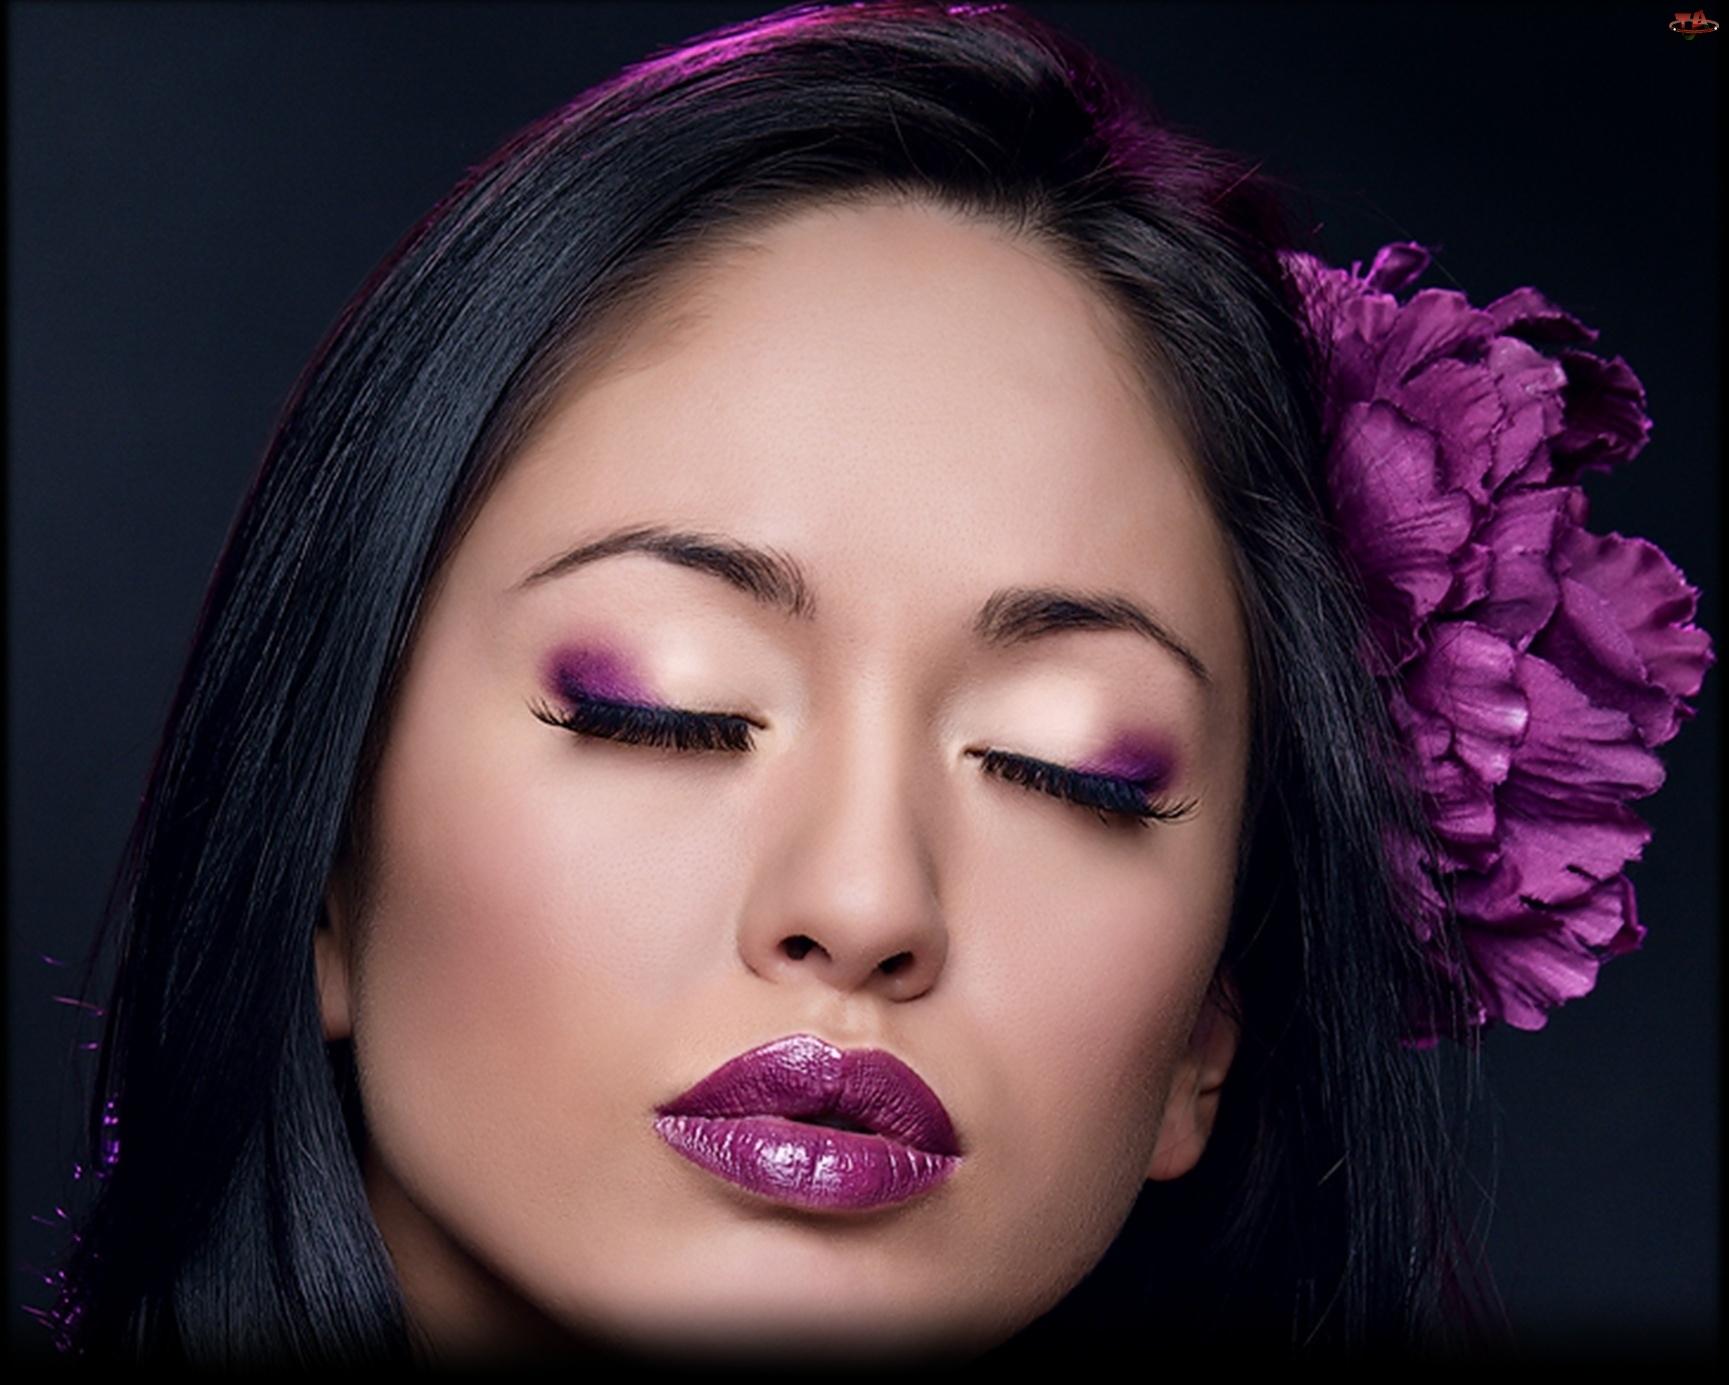 Kwiatek, Kobieta, Makijaż